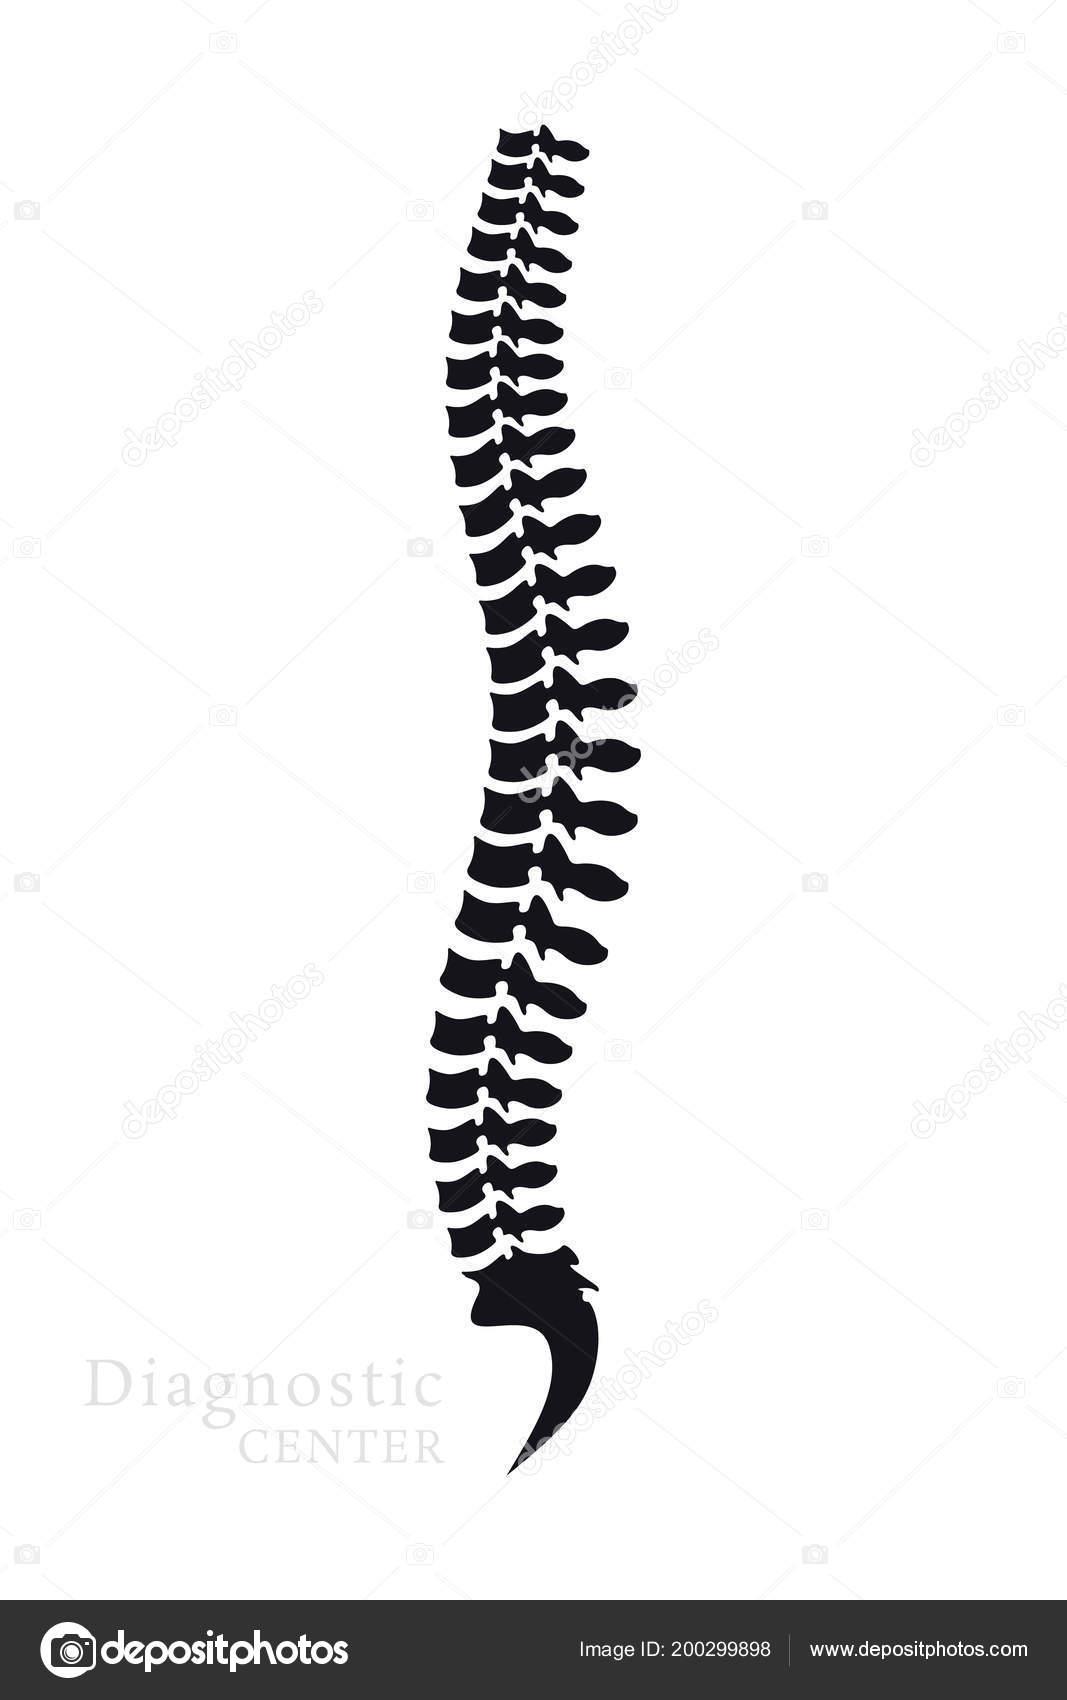 Columna Vertebral Todas Las Vértebras Cervical Torácica Lumbar Sacra ...